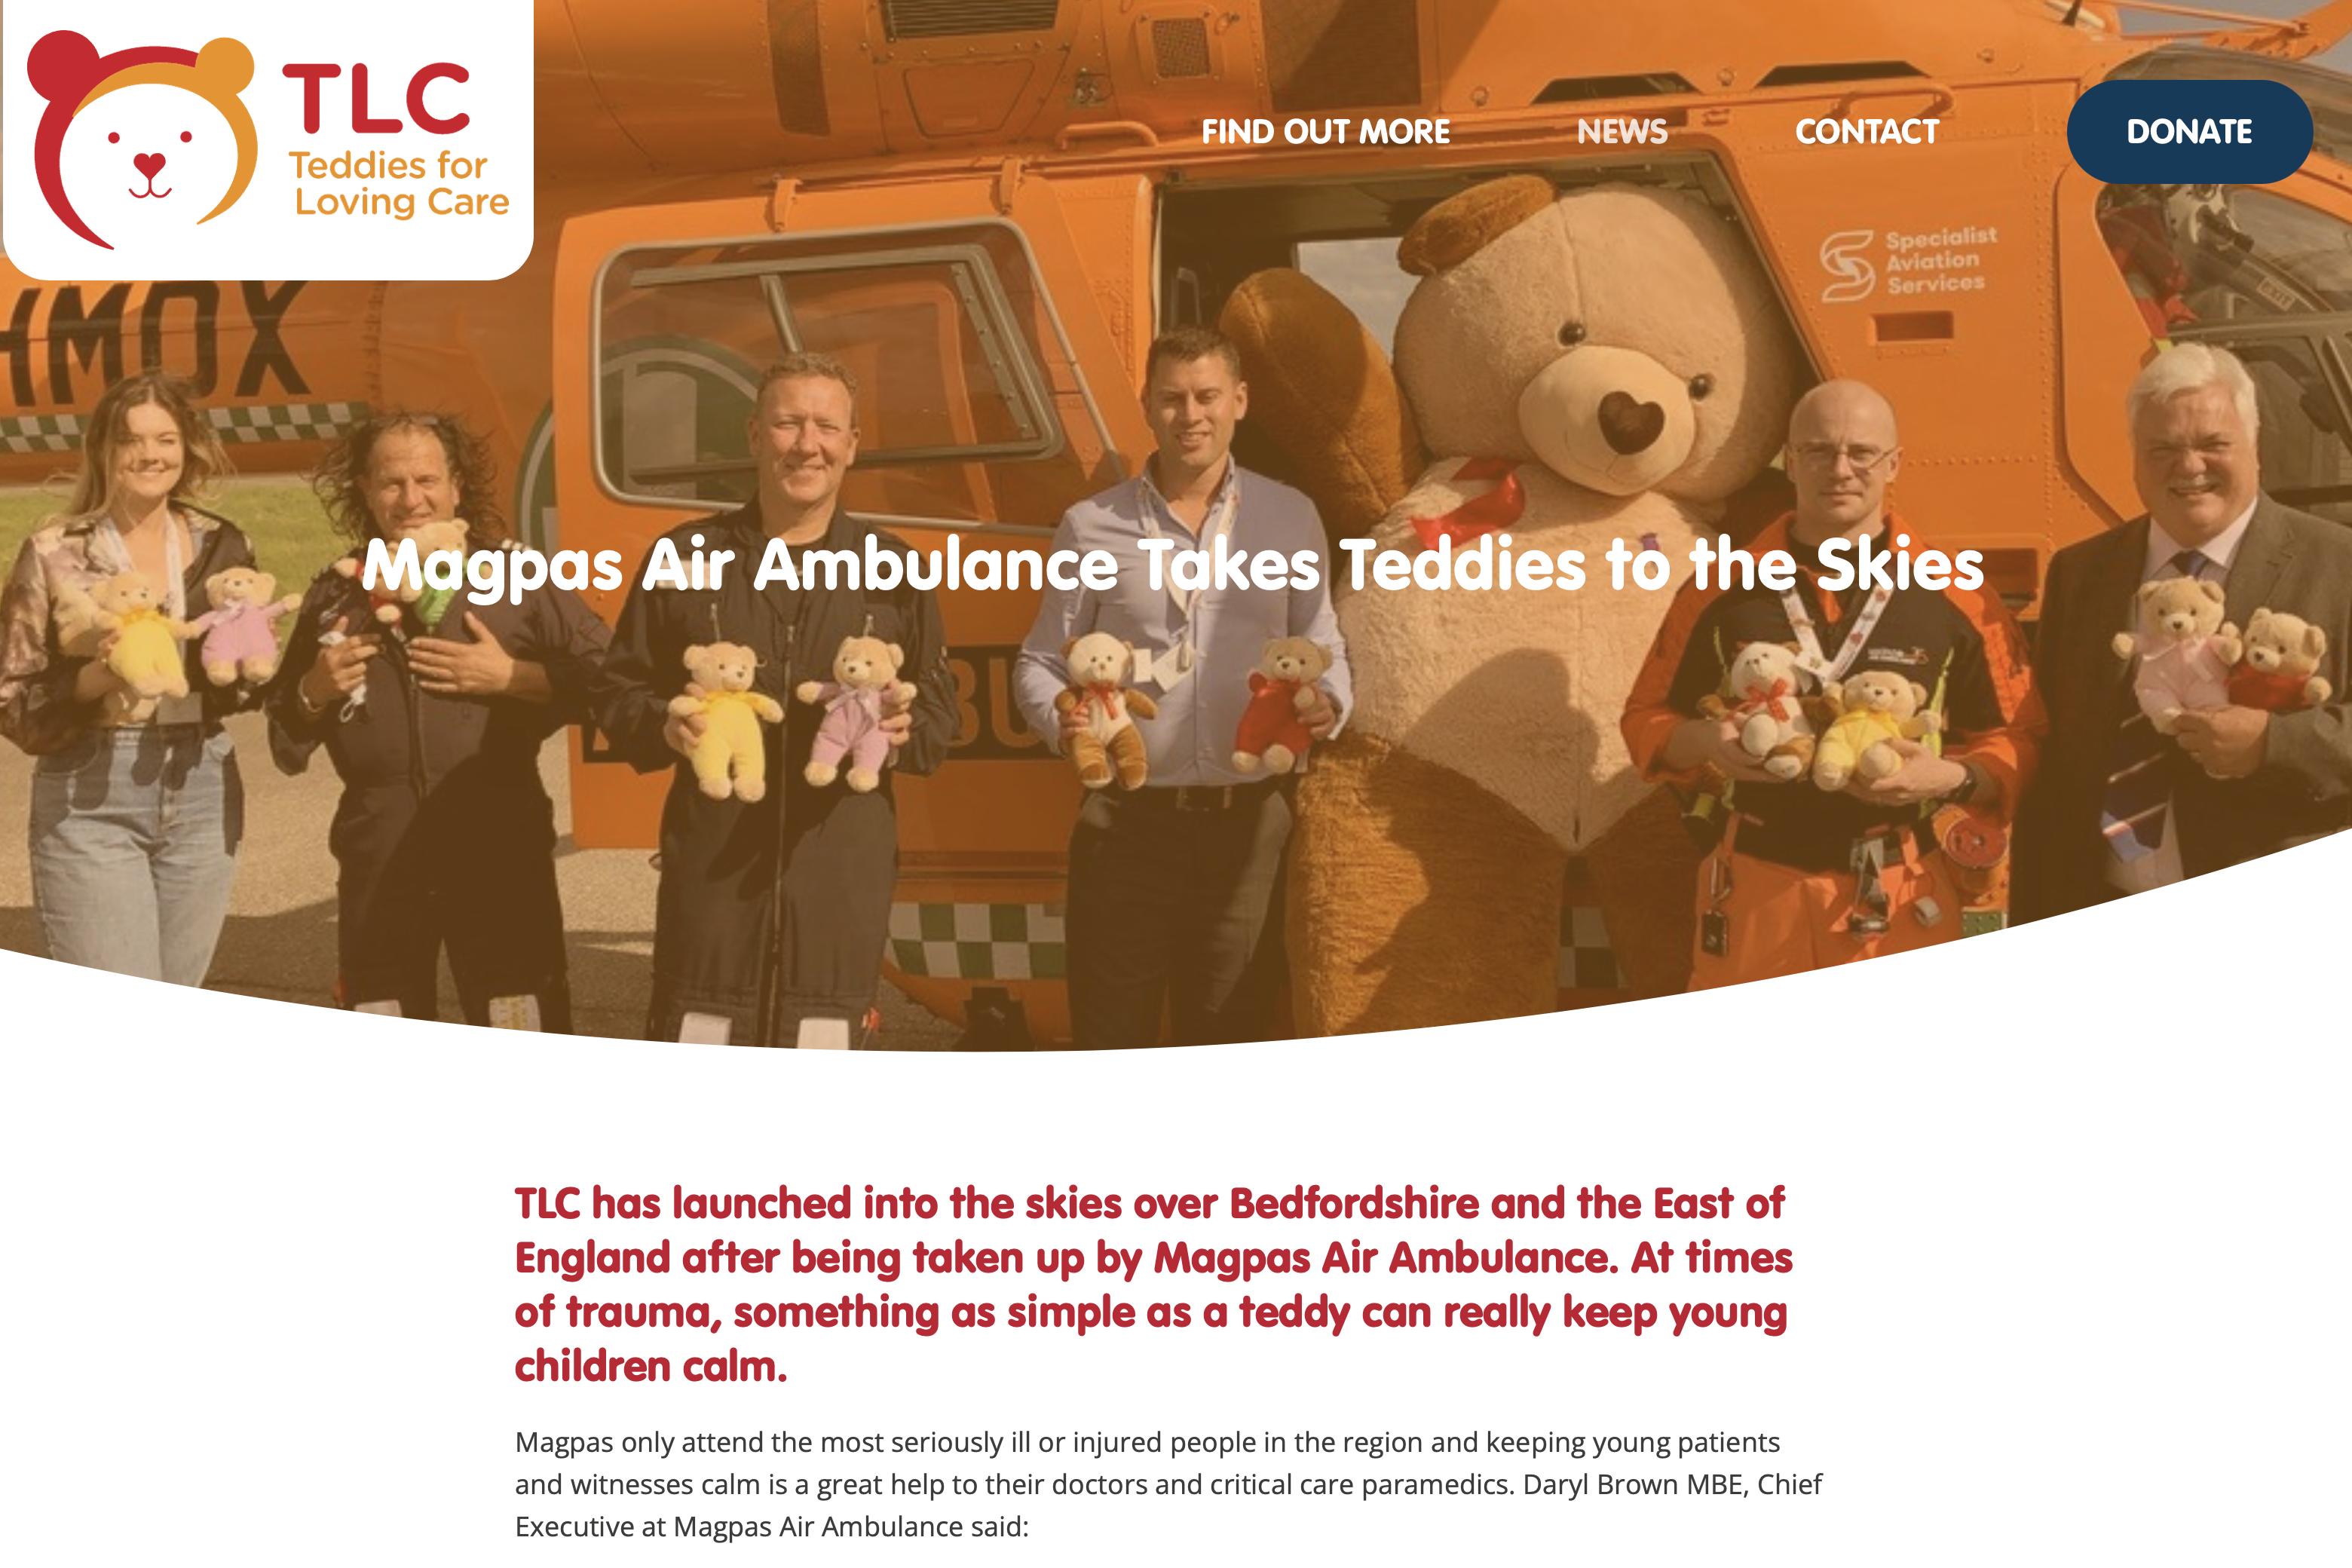 TLC Website Features Bedfordshire